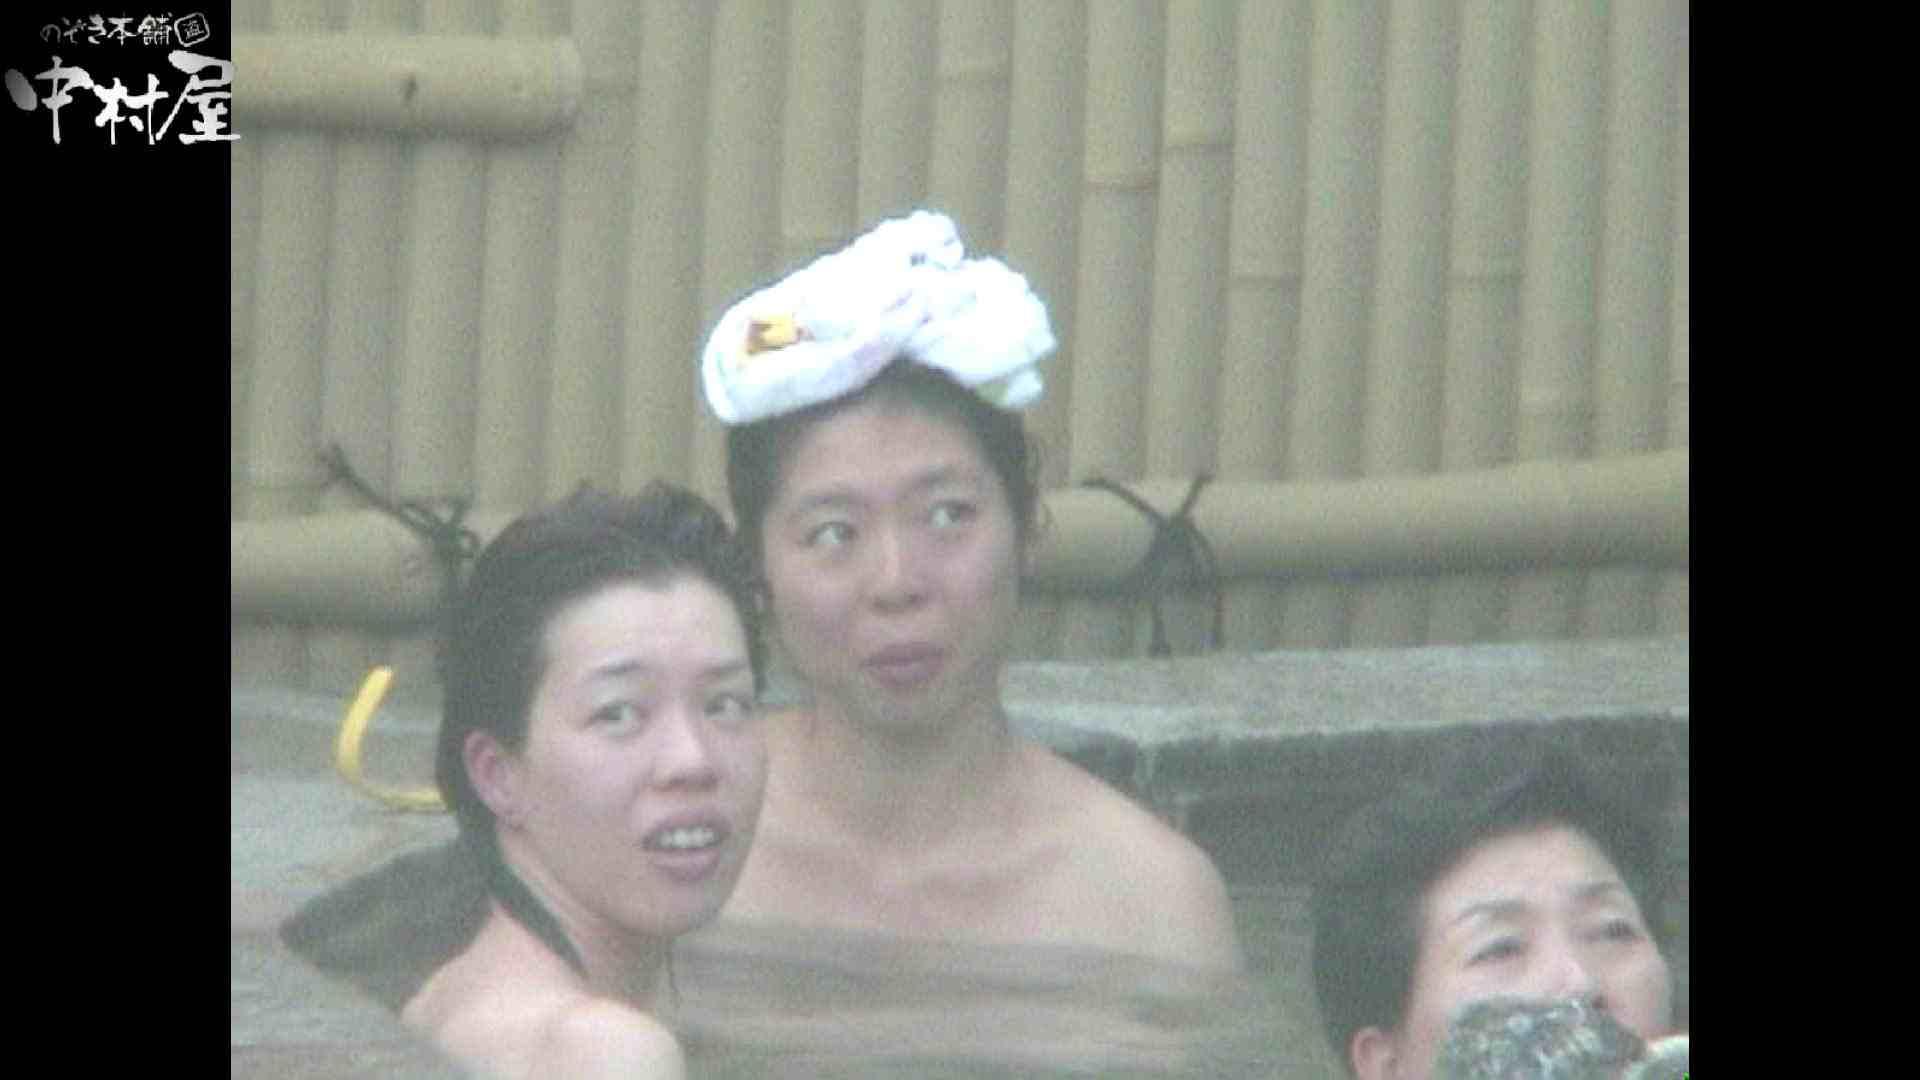 Aquaな露天風呂Vol.932 美しいOLの裸体 おまんこ無修正動画無料 106pic 5